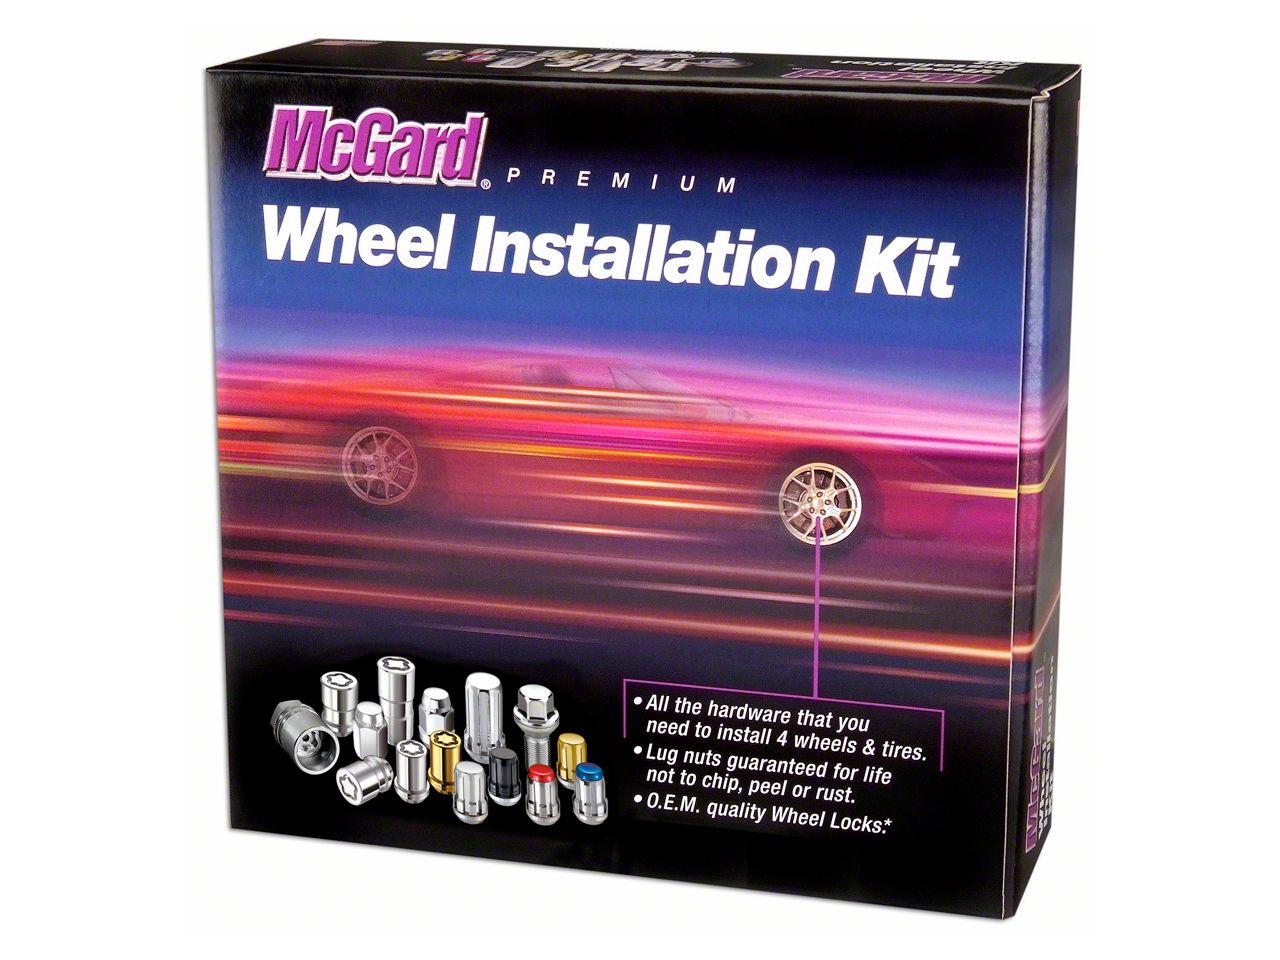 McGard Gold SplineDrive 6-Lug Wheel Installation Kit - 14mm x 1.5 in. (99-19 Silverado 1500)